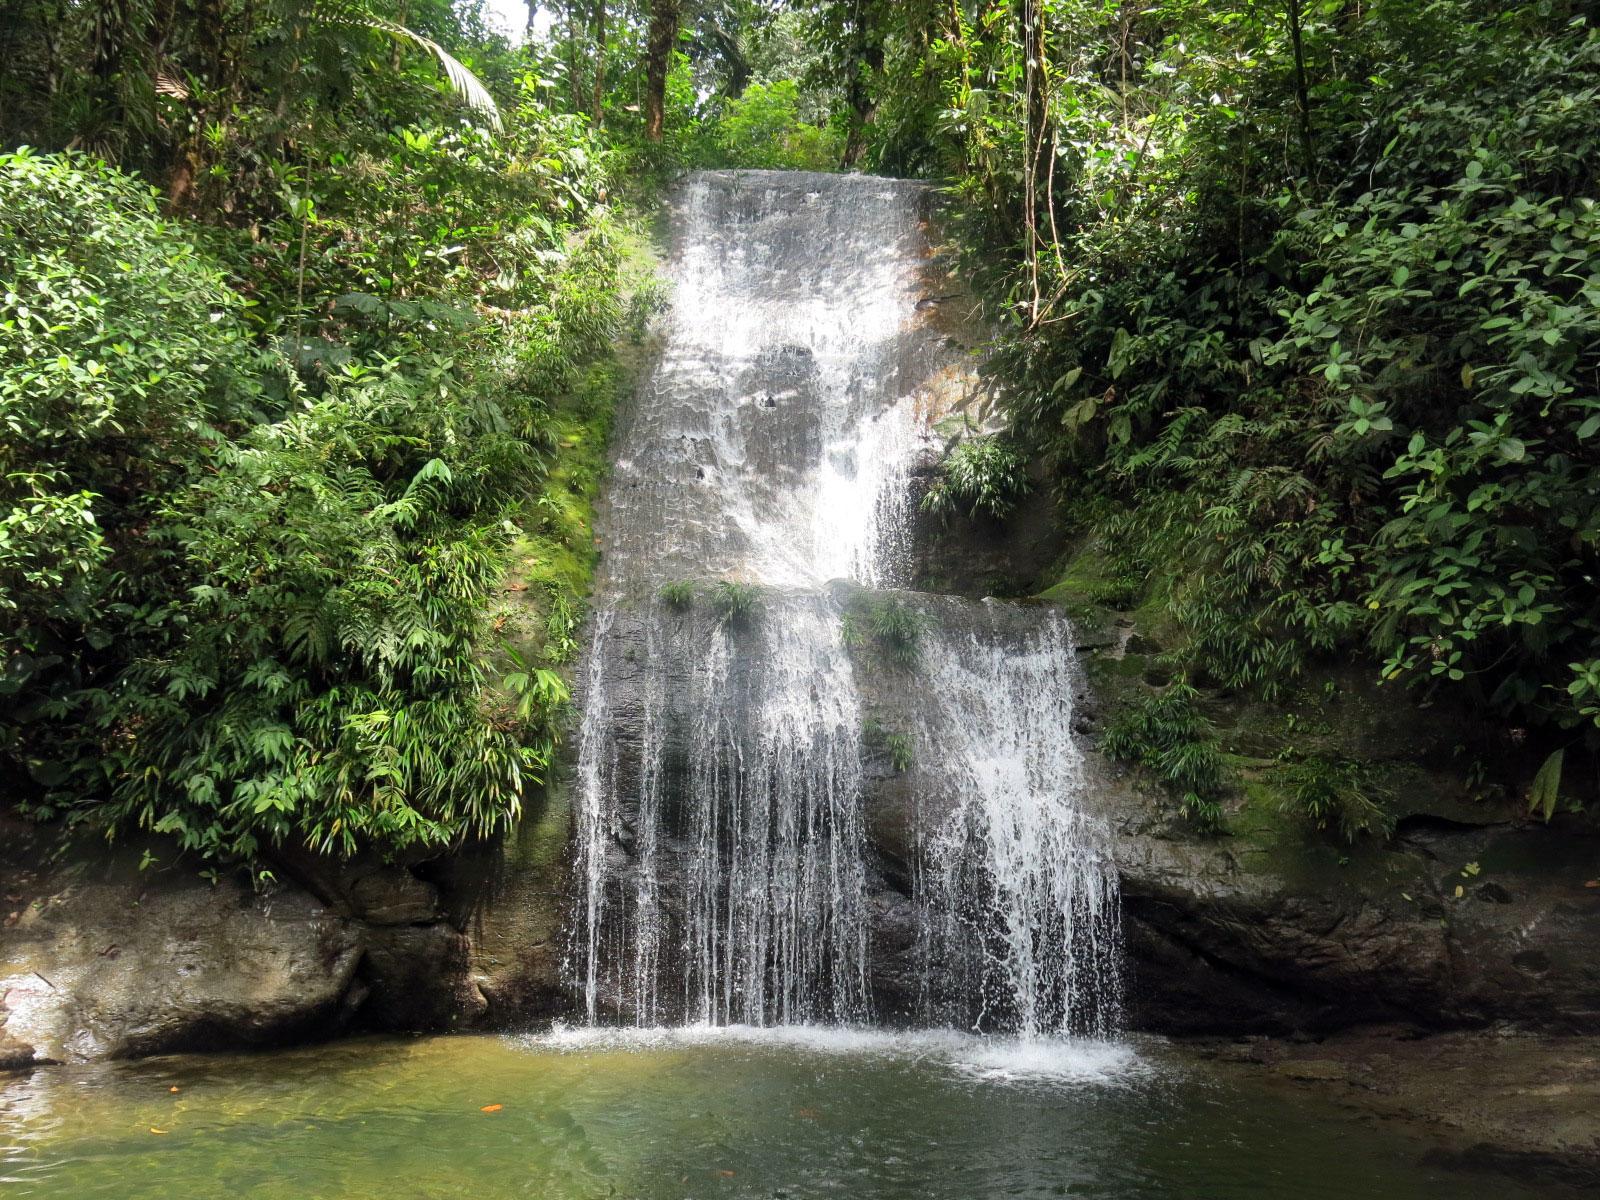 Fotografía frontal de la cascada ostional